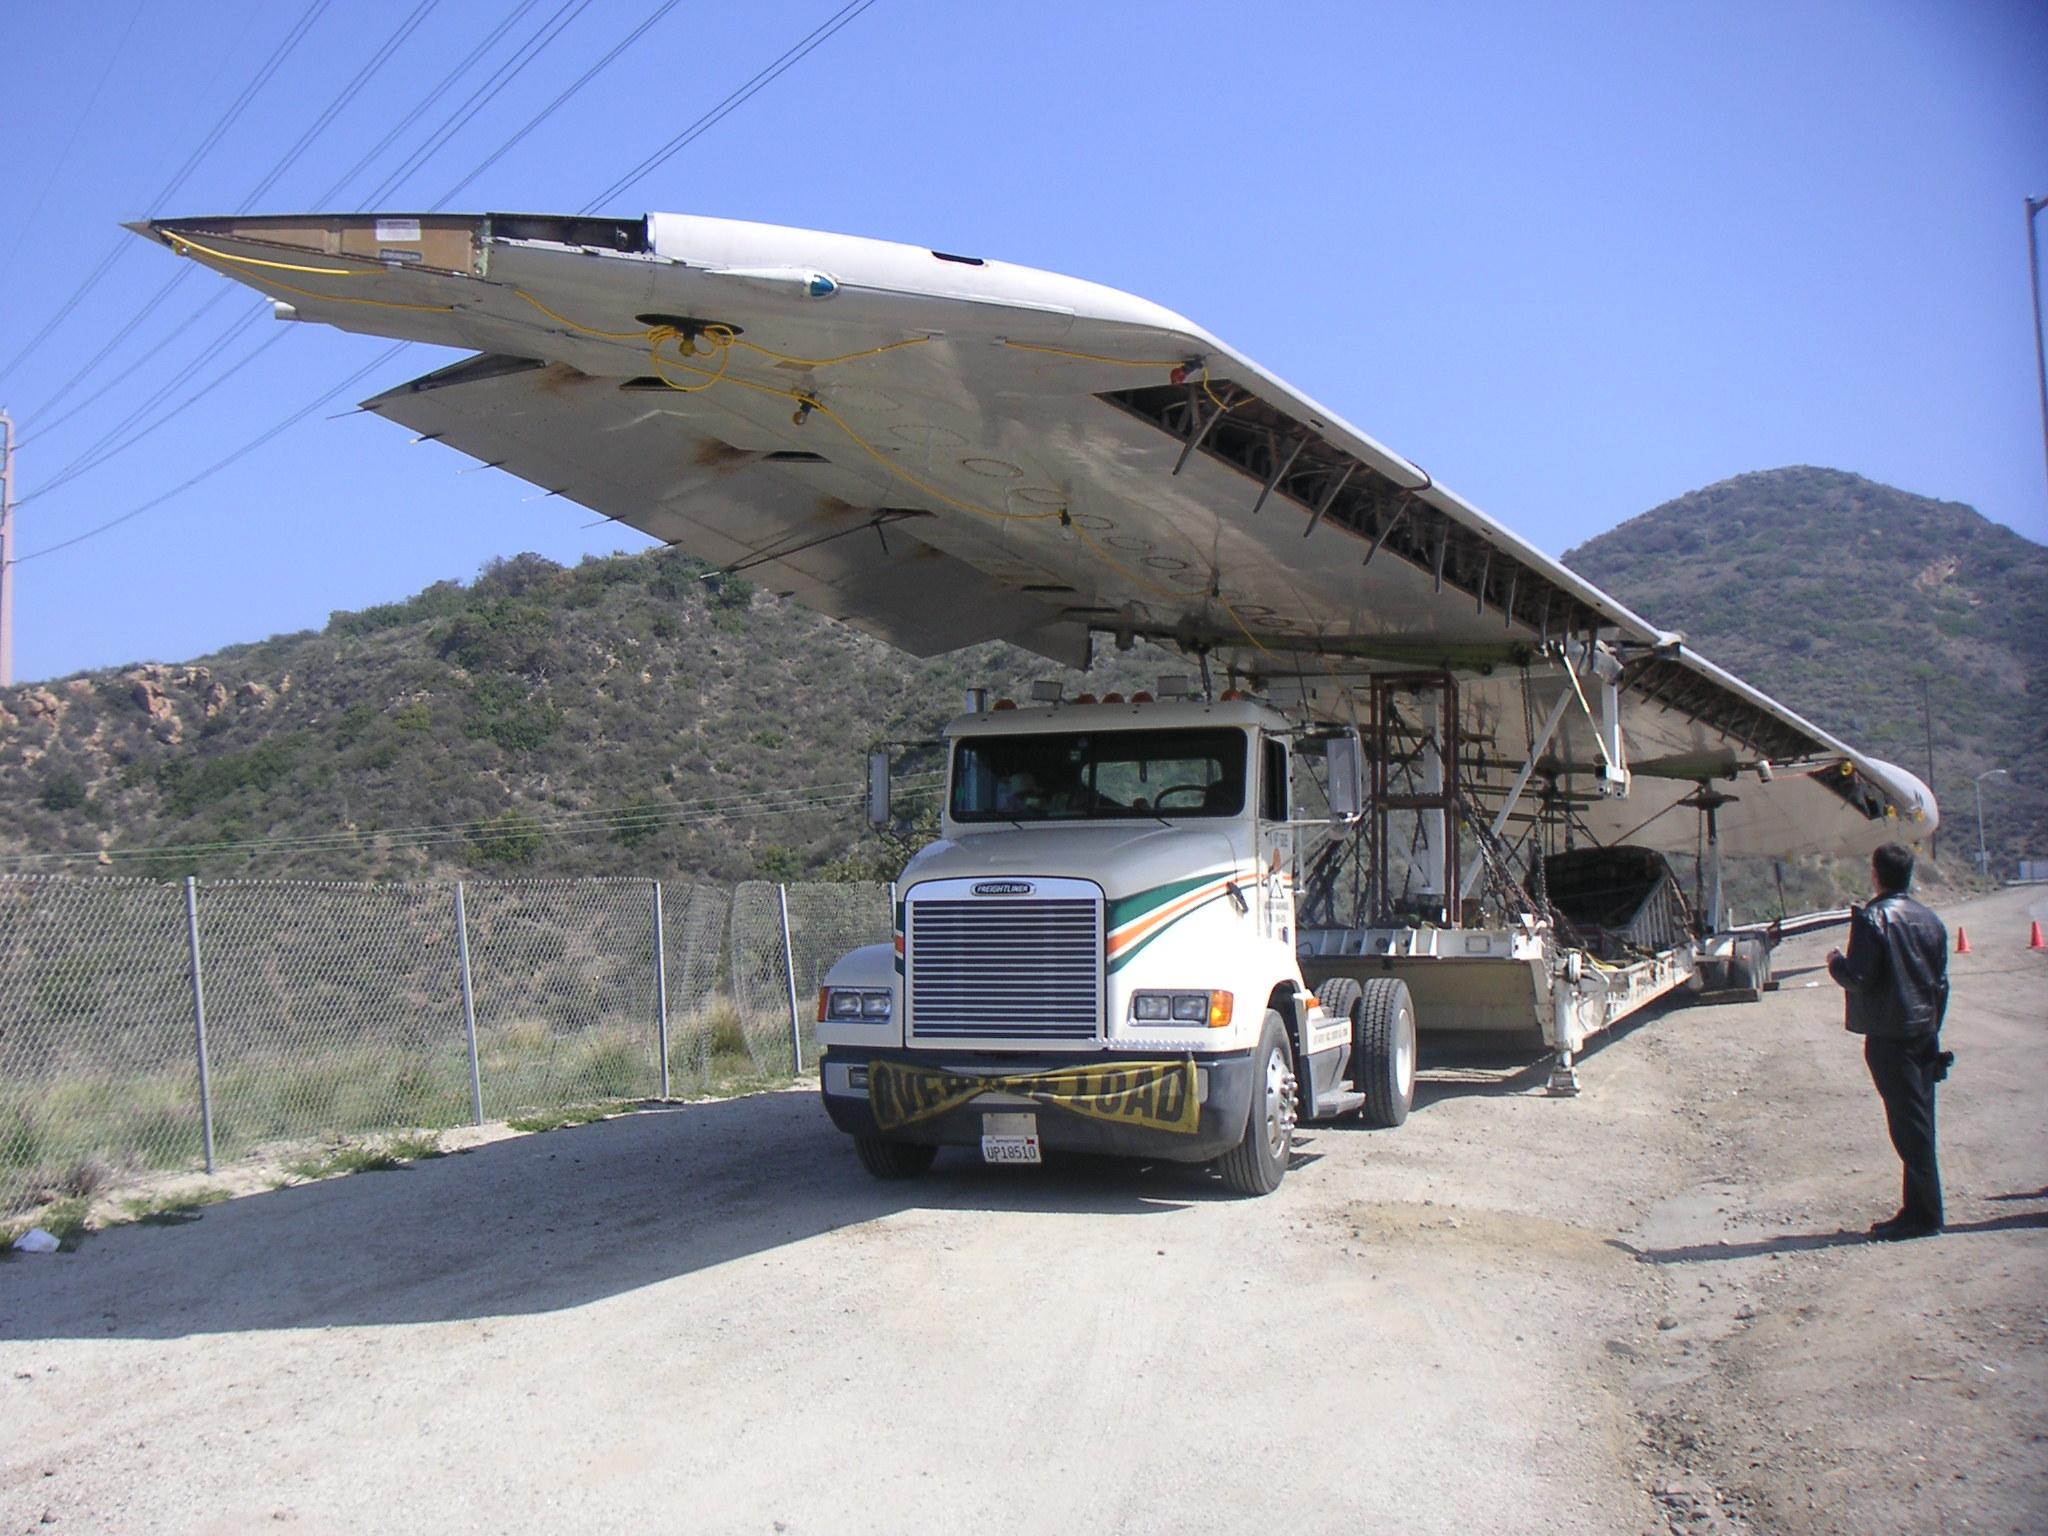 file 747 wing on semi truck jpg wikimedia commons